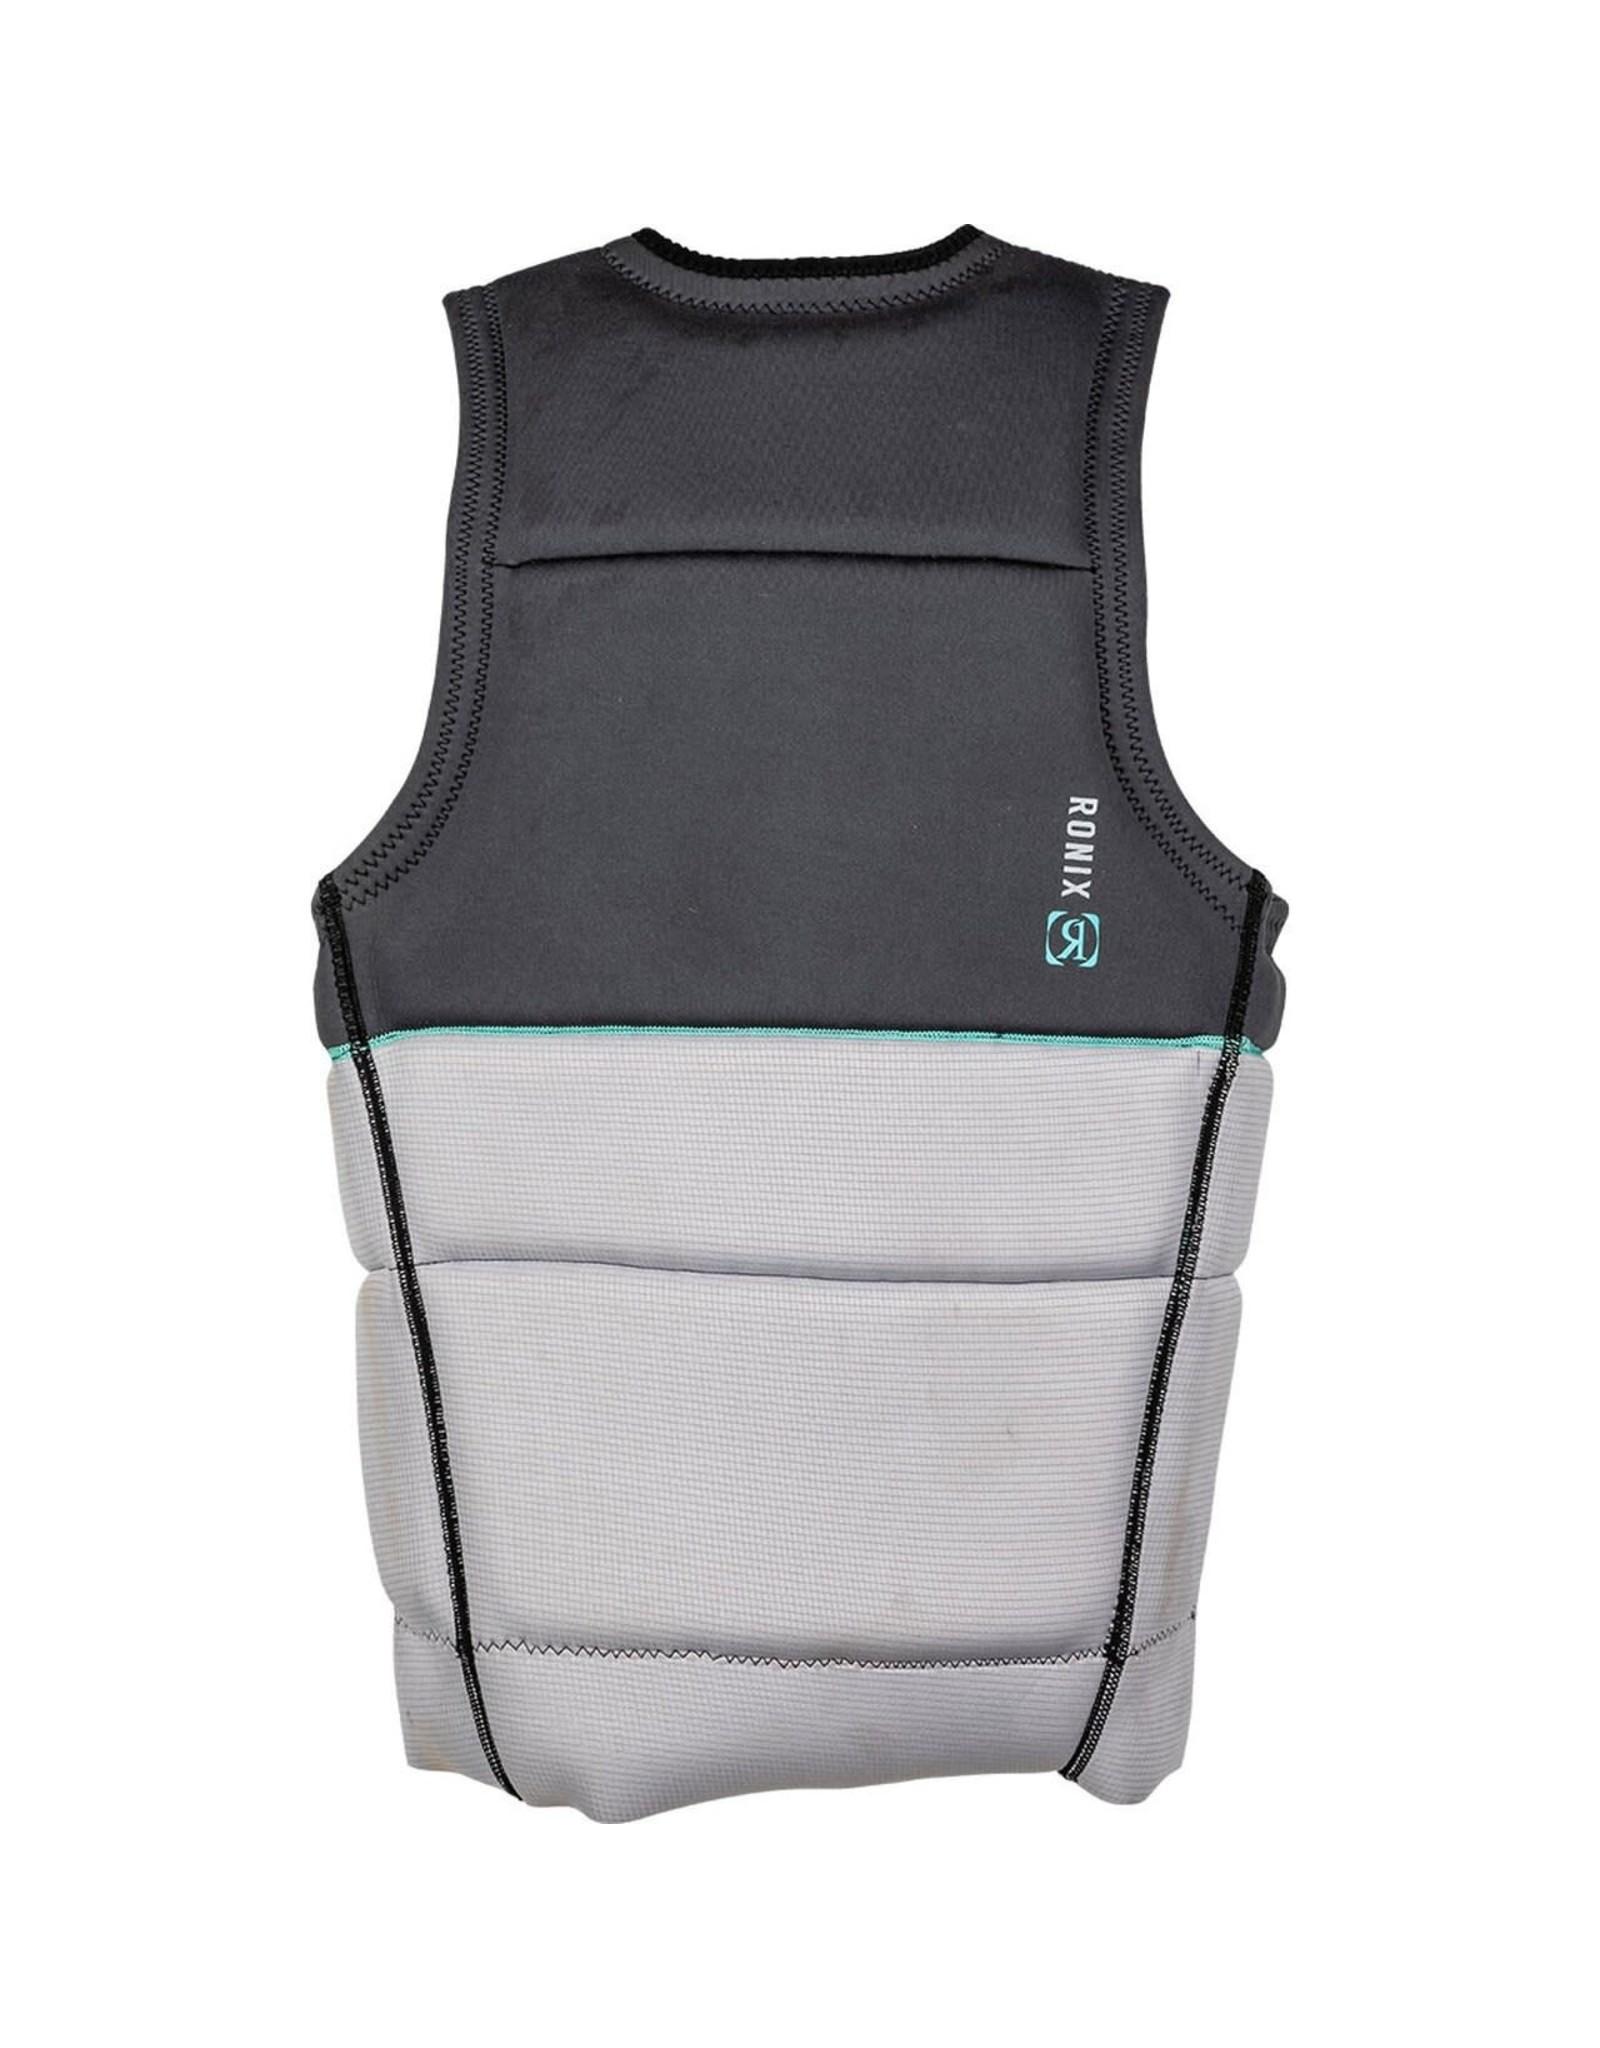 Ronix Supreme - Impact Vest - 2020